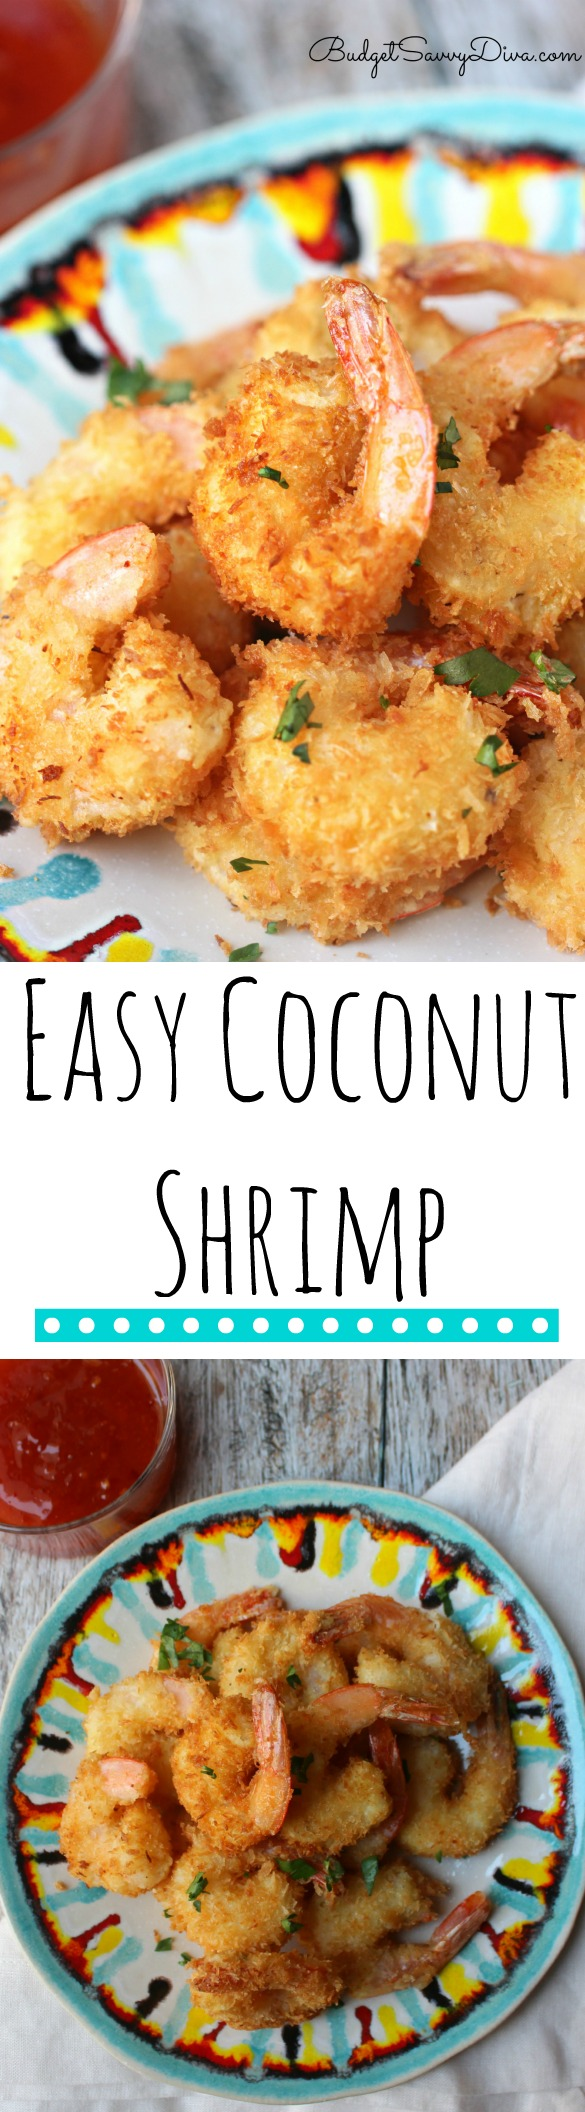 Coconut shrimp FINAL